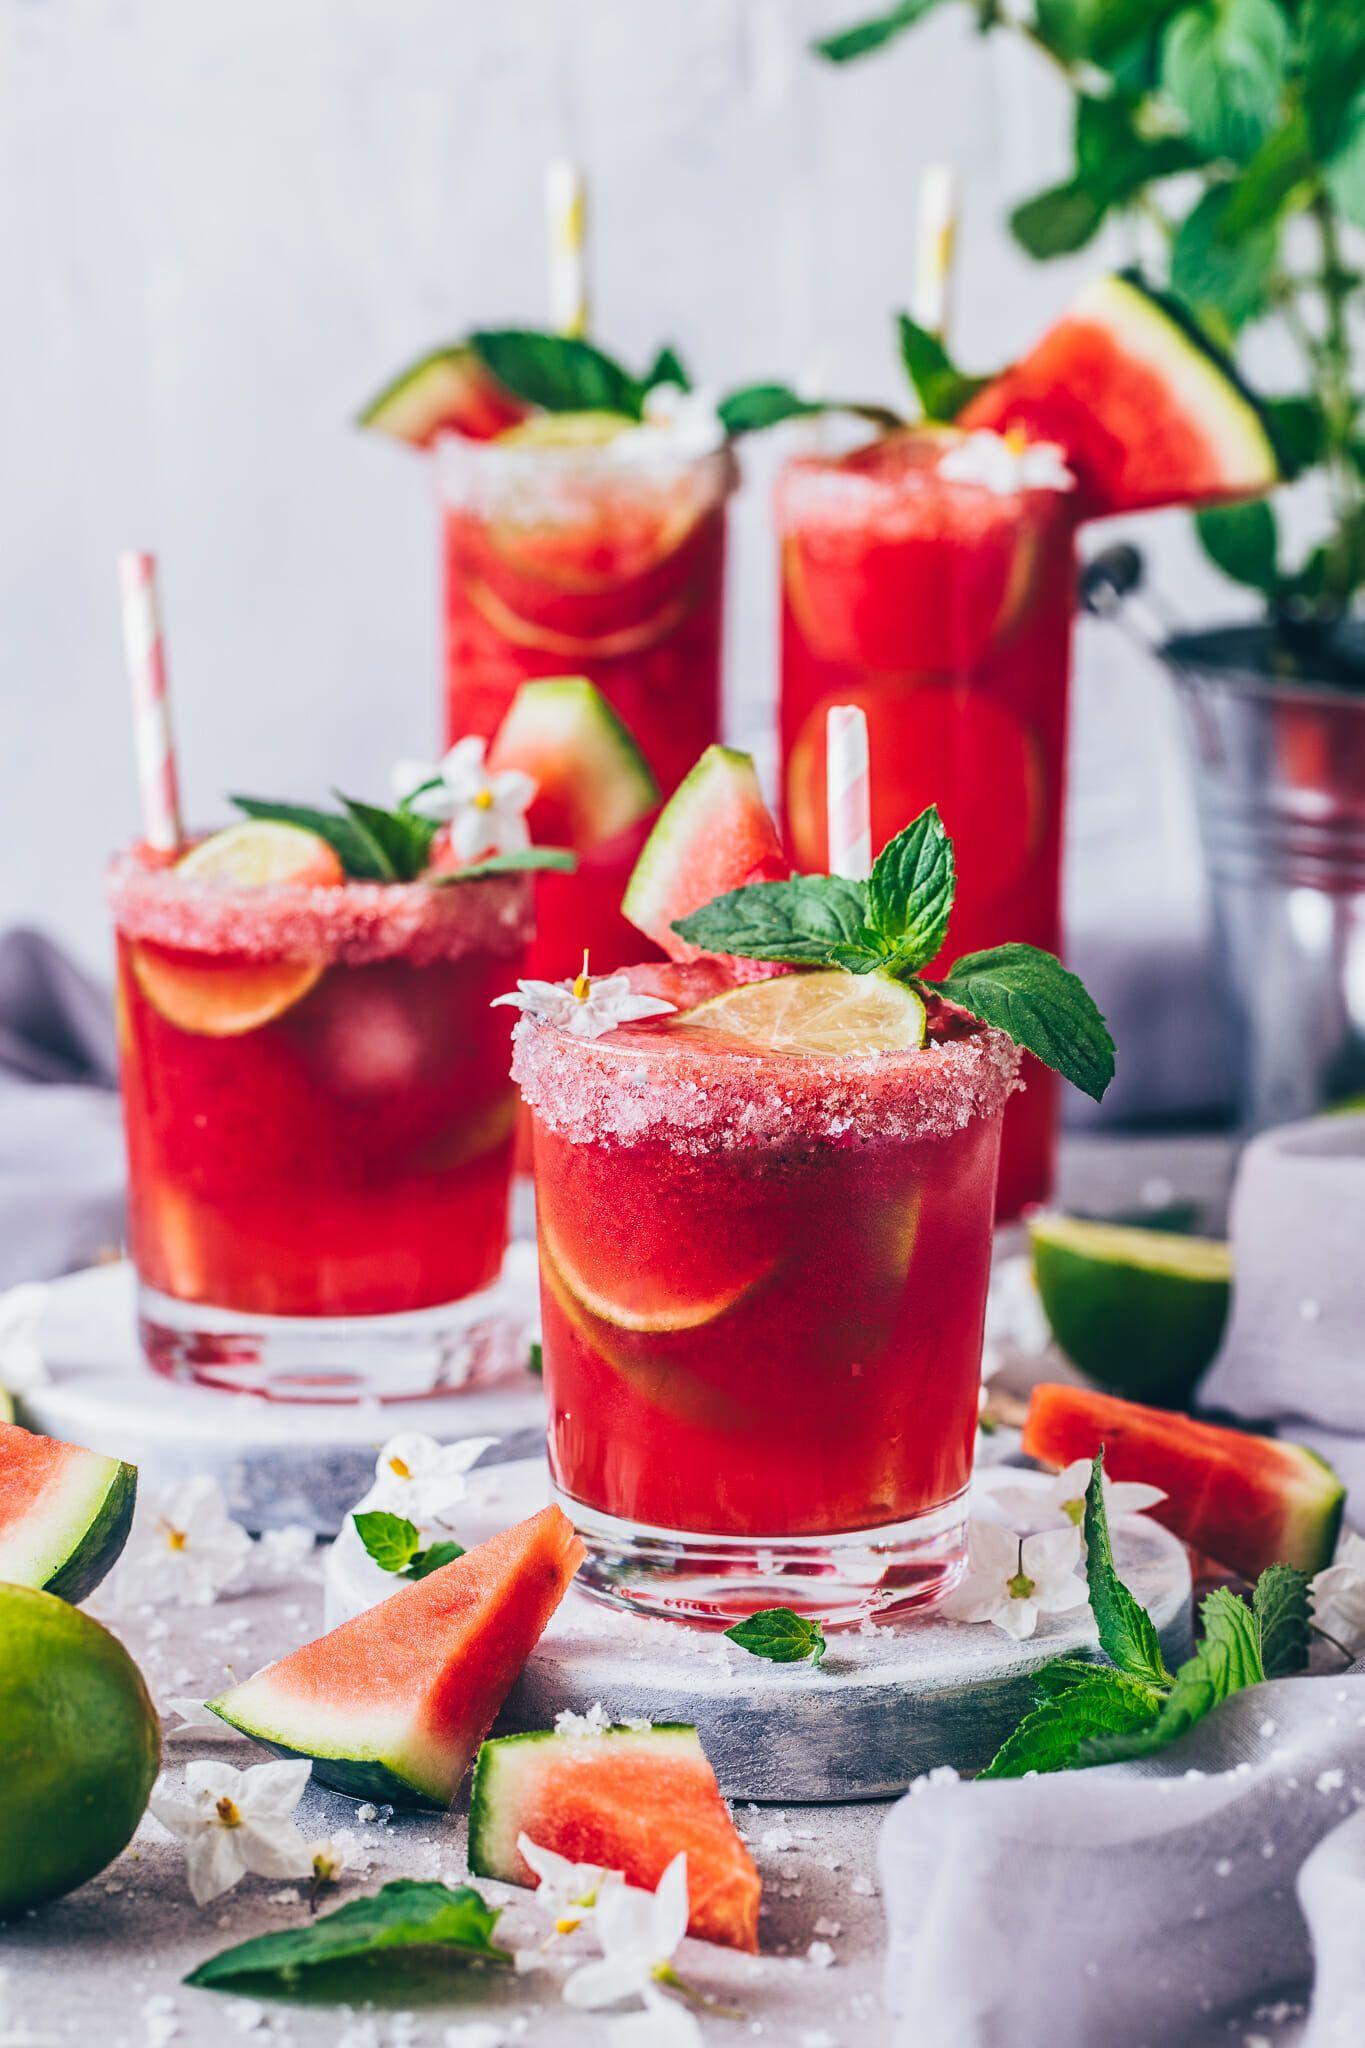 Watermelon Margarita Frozen Slush Cocktail Wassermelone Cocktail Coctail Rezepte Rezepte